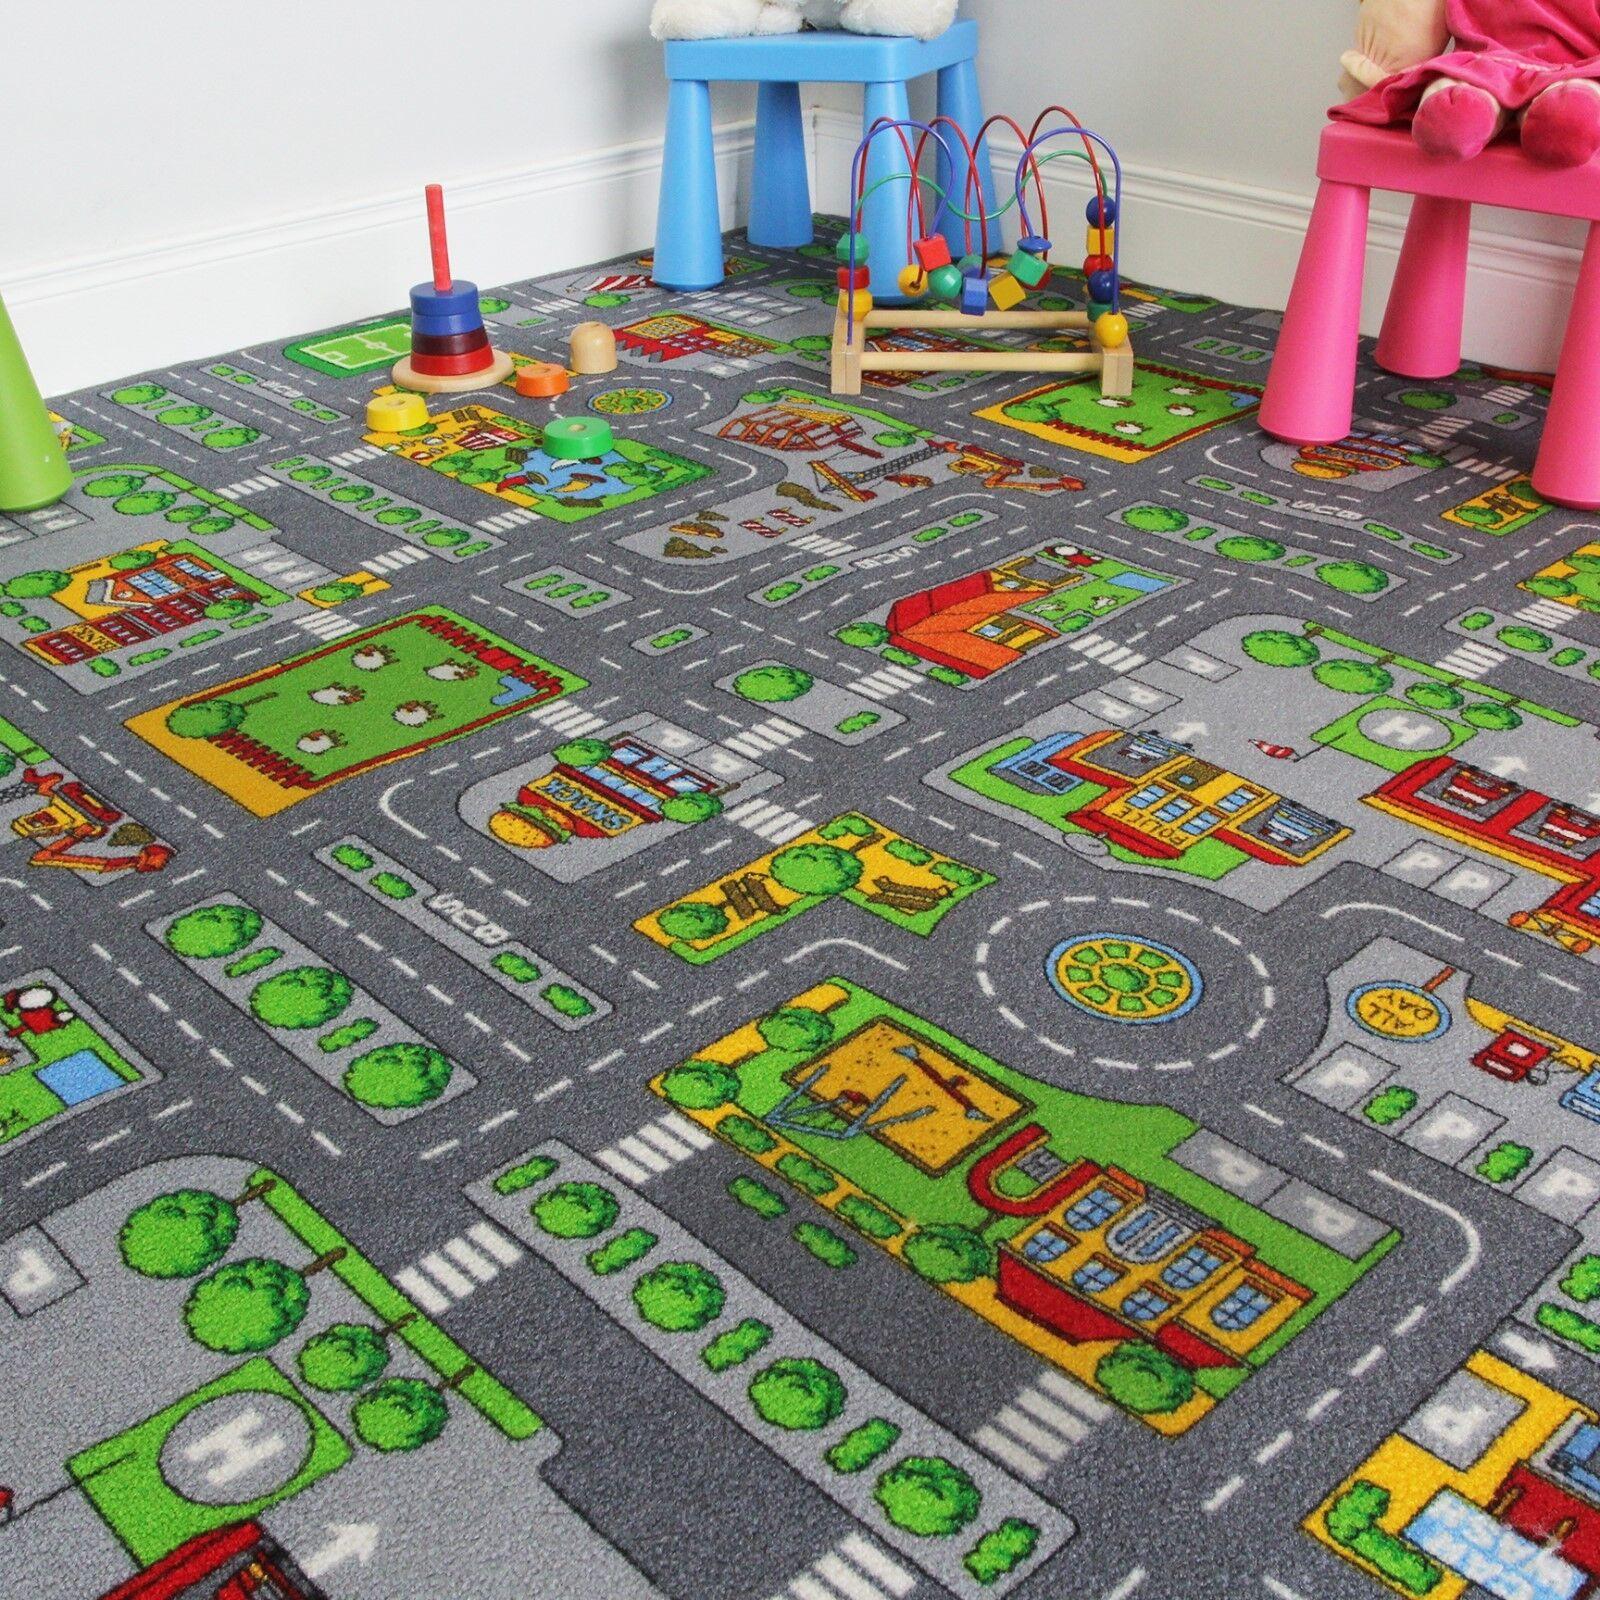 200x200 Square Street Kids Village Town